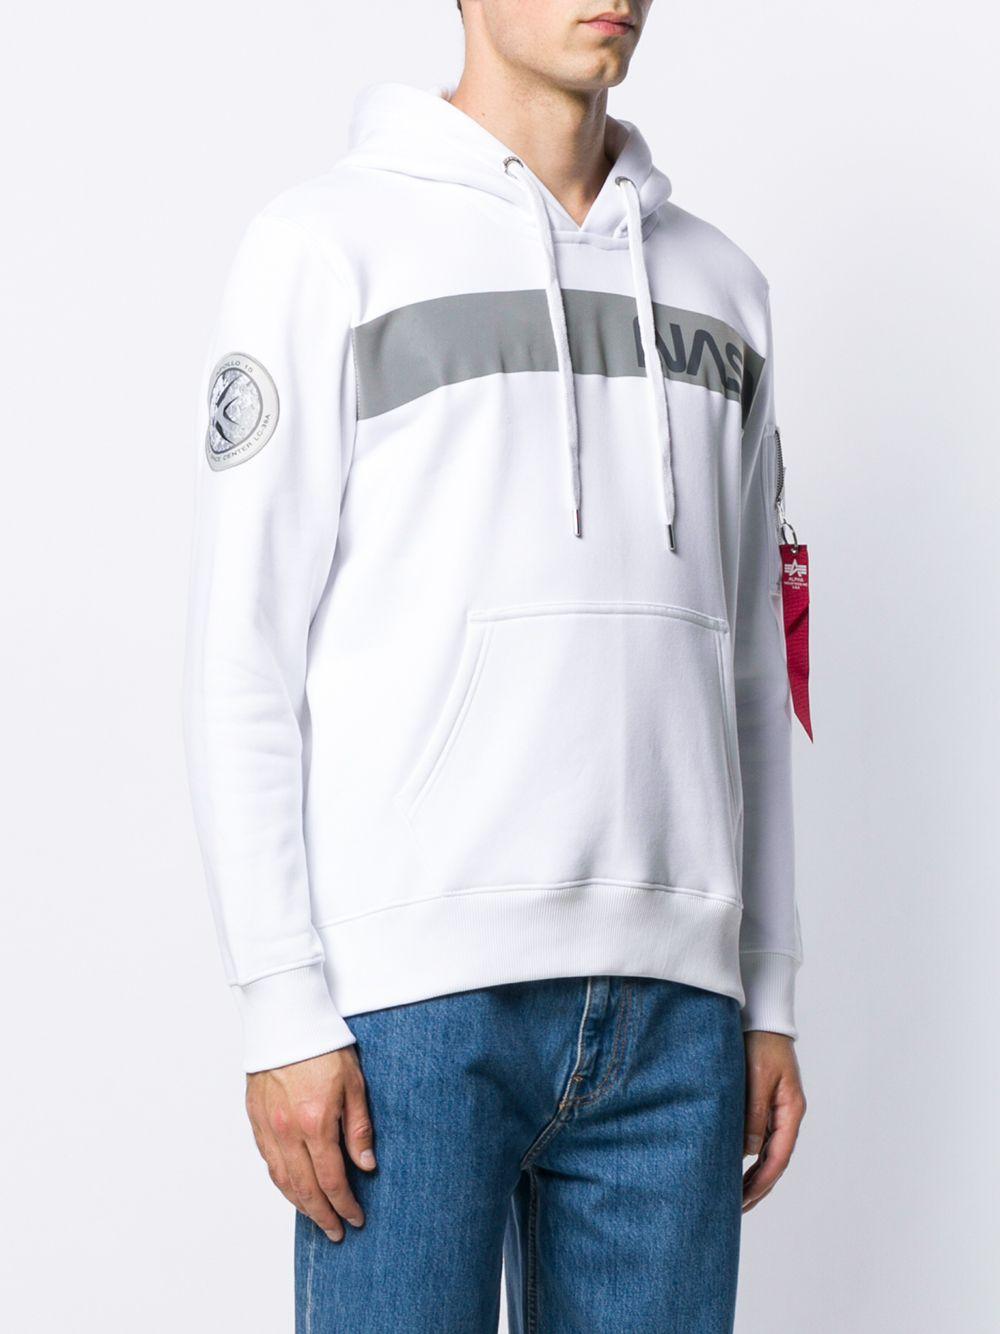 nasa rs hoodie man white in cotton ALPHA INDUSTRIES | Sweatshirts | 19831309